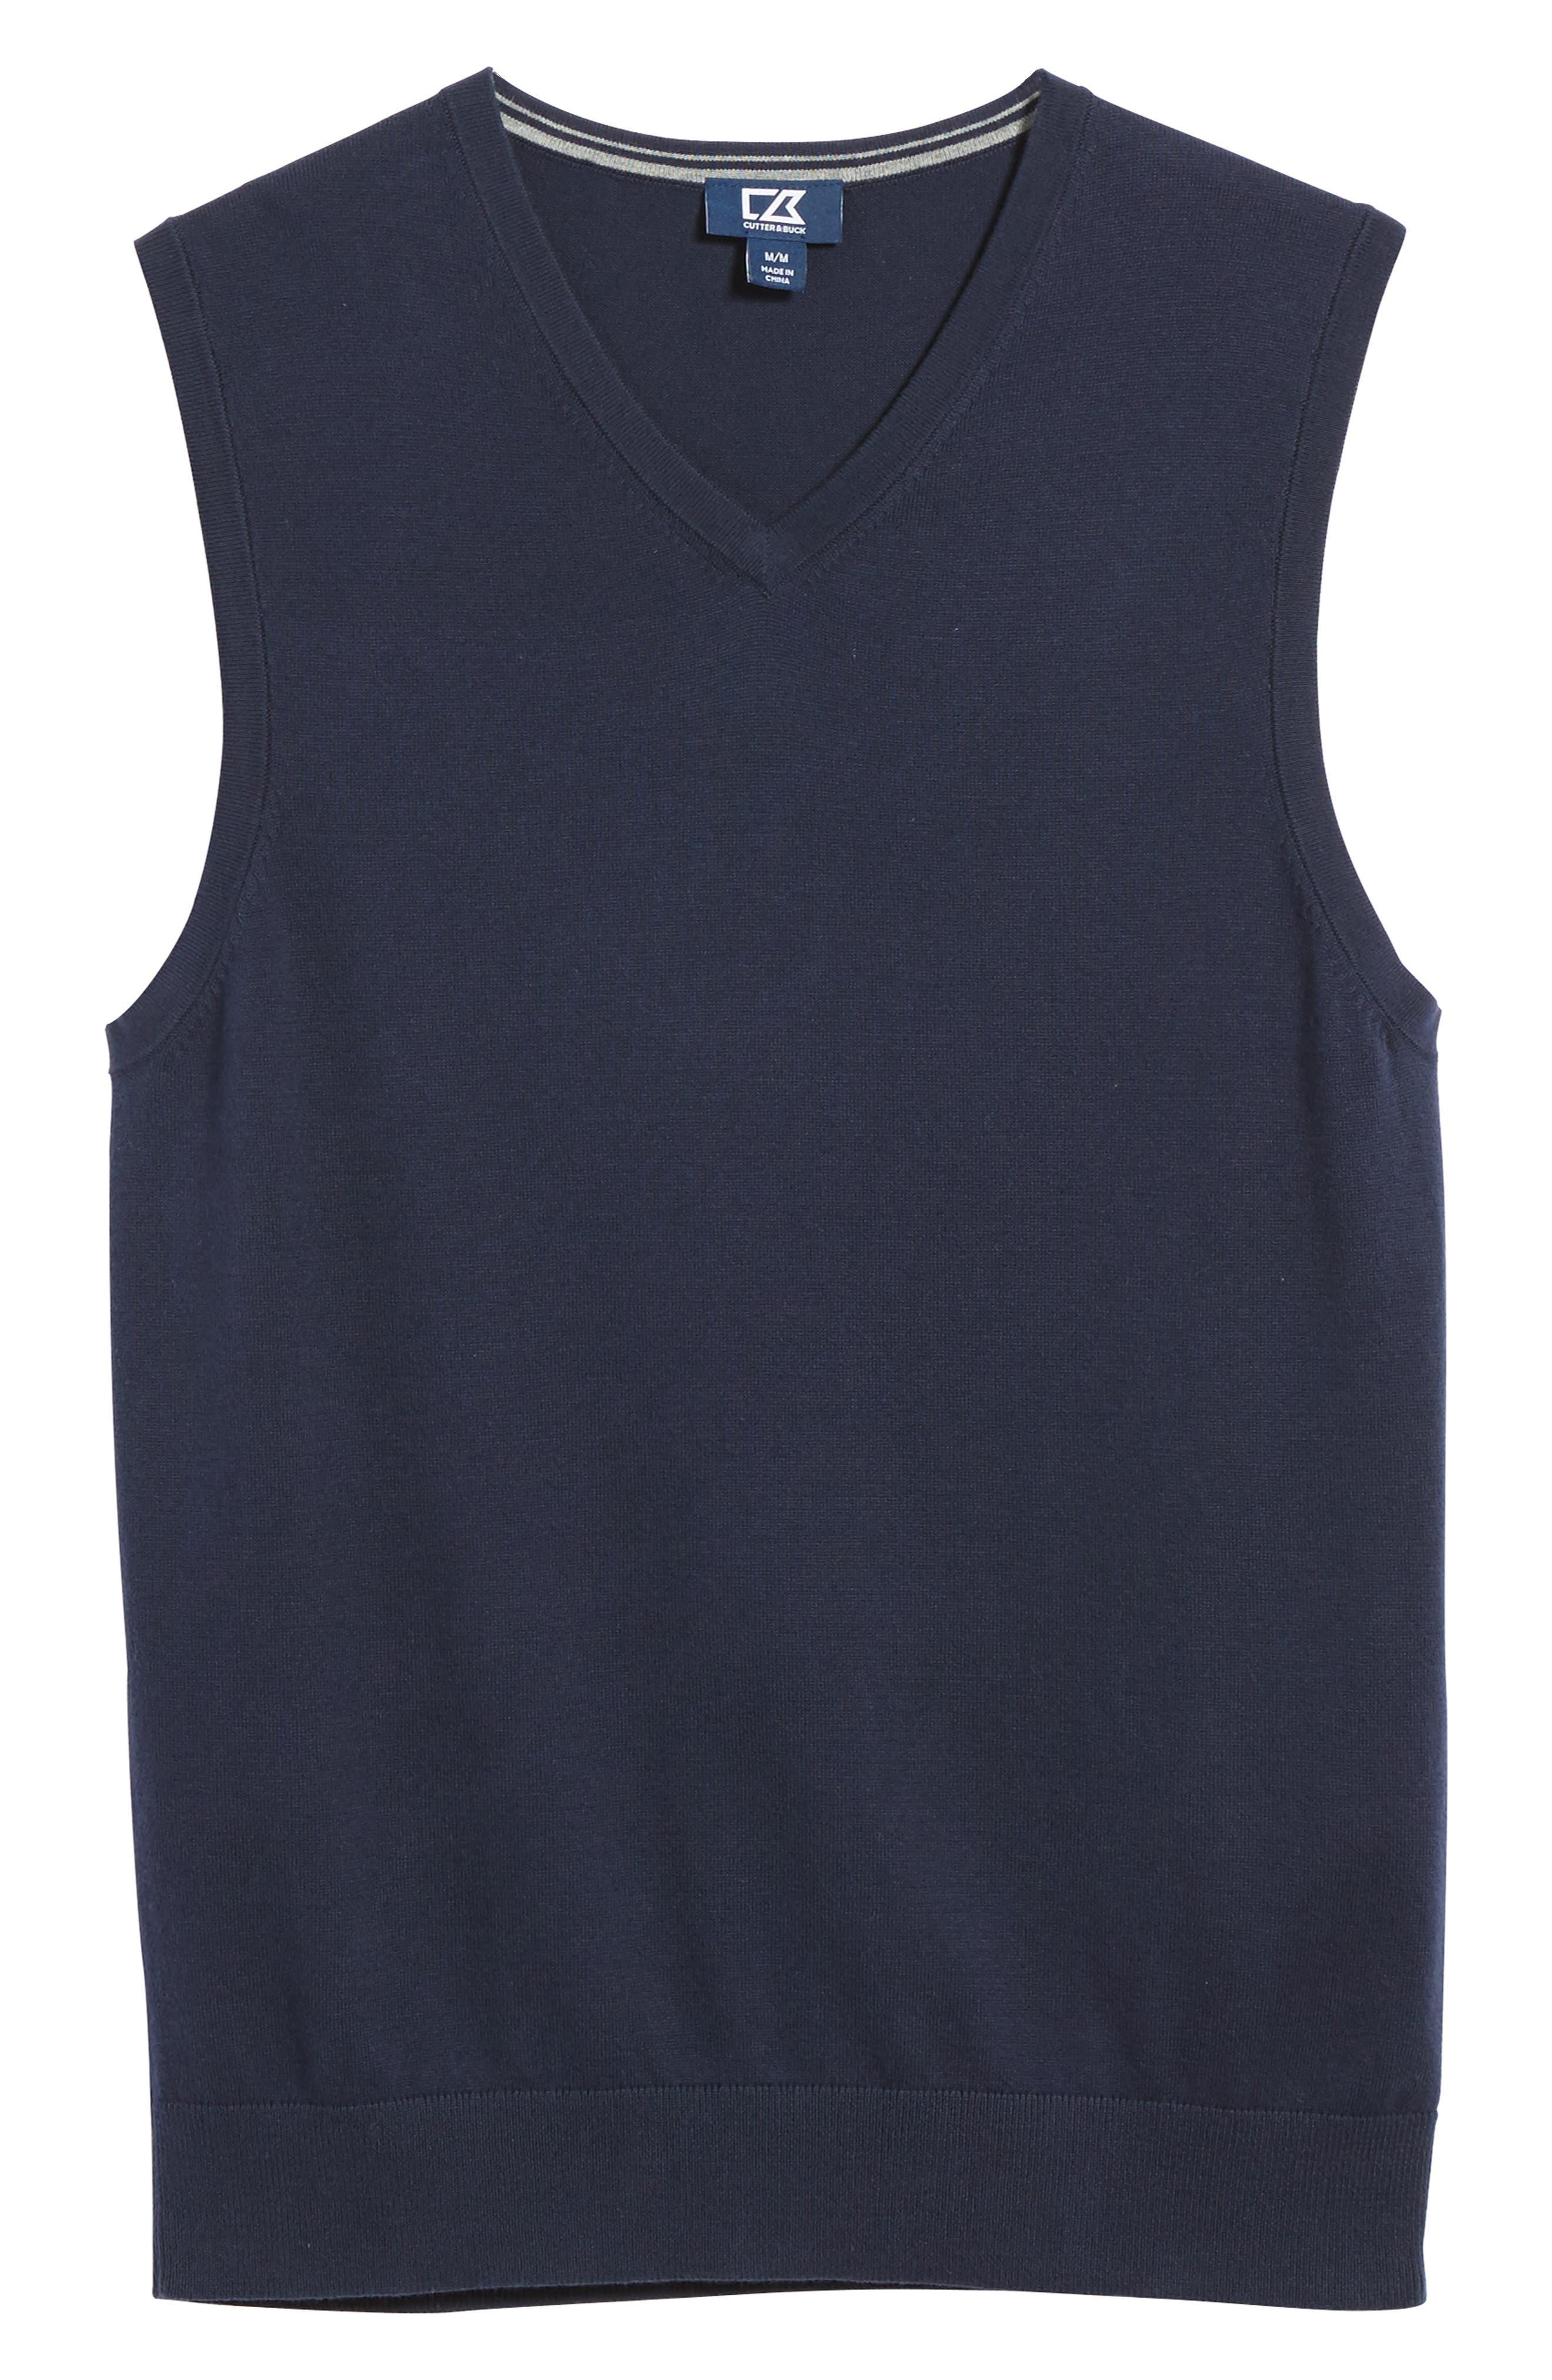 Lakemont V-Neck Sweater Vest,                             Alternate thumbnail 6, color,                             Liberty Navy